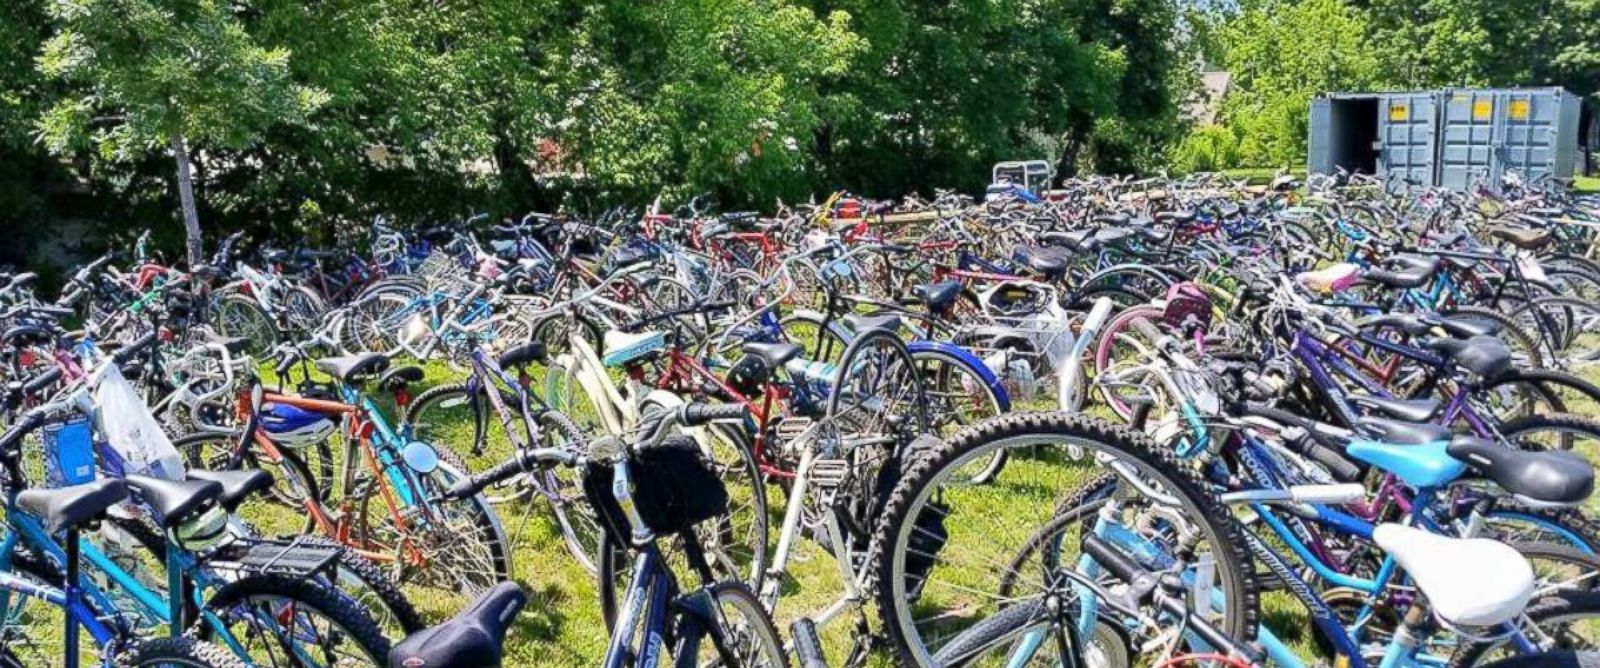 PHOTO: When Conkey Cruisers, a neighborhood bike program, had bikes stolen, the community donated three times as many bikes back to them.